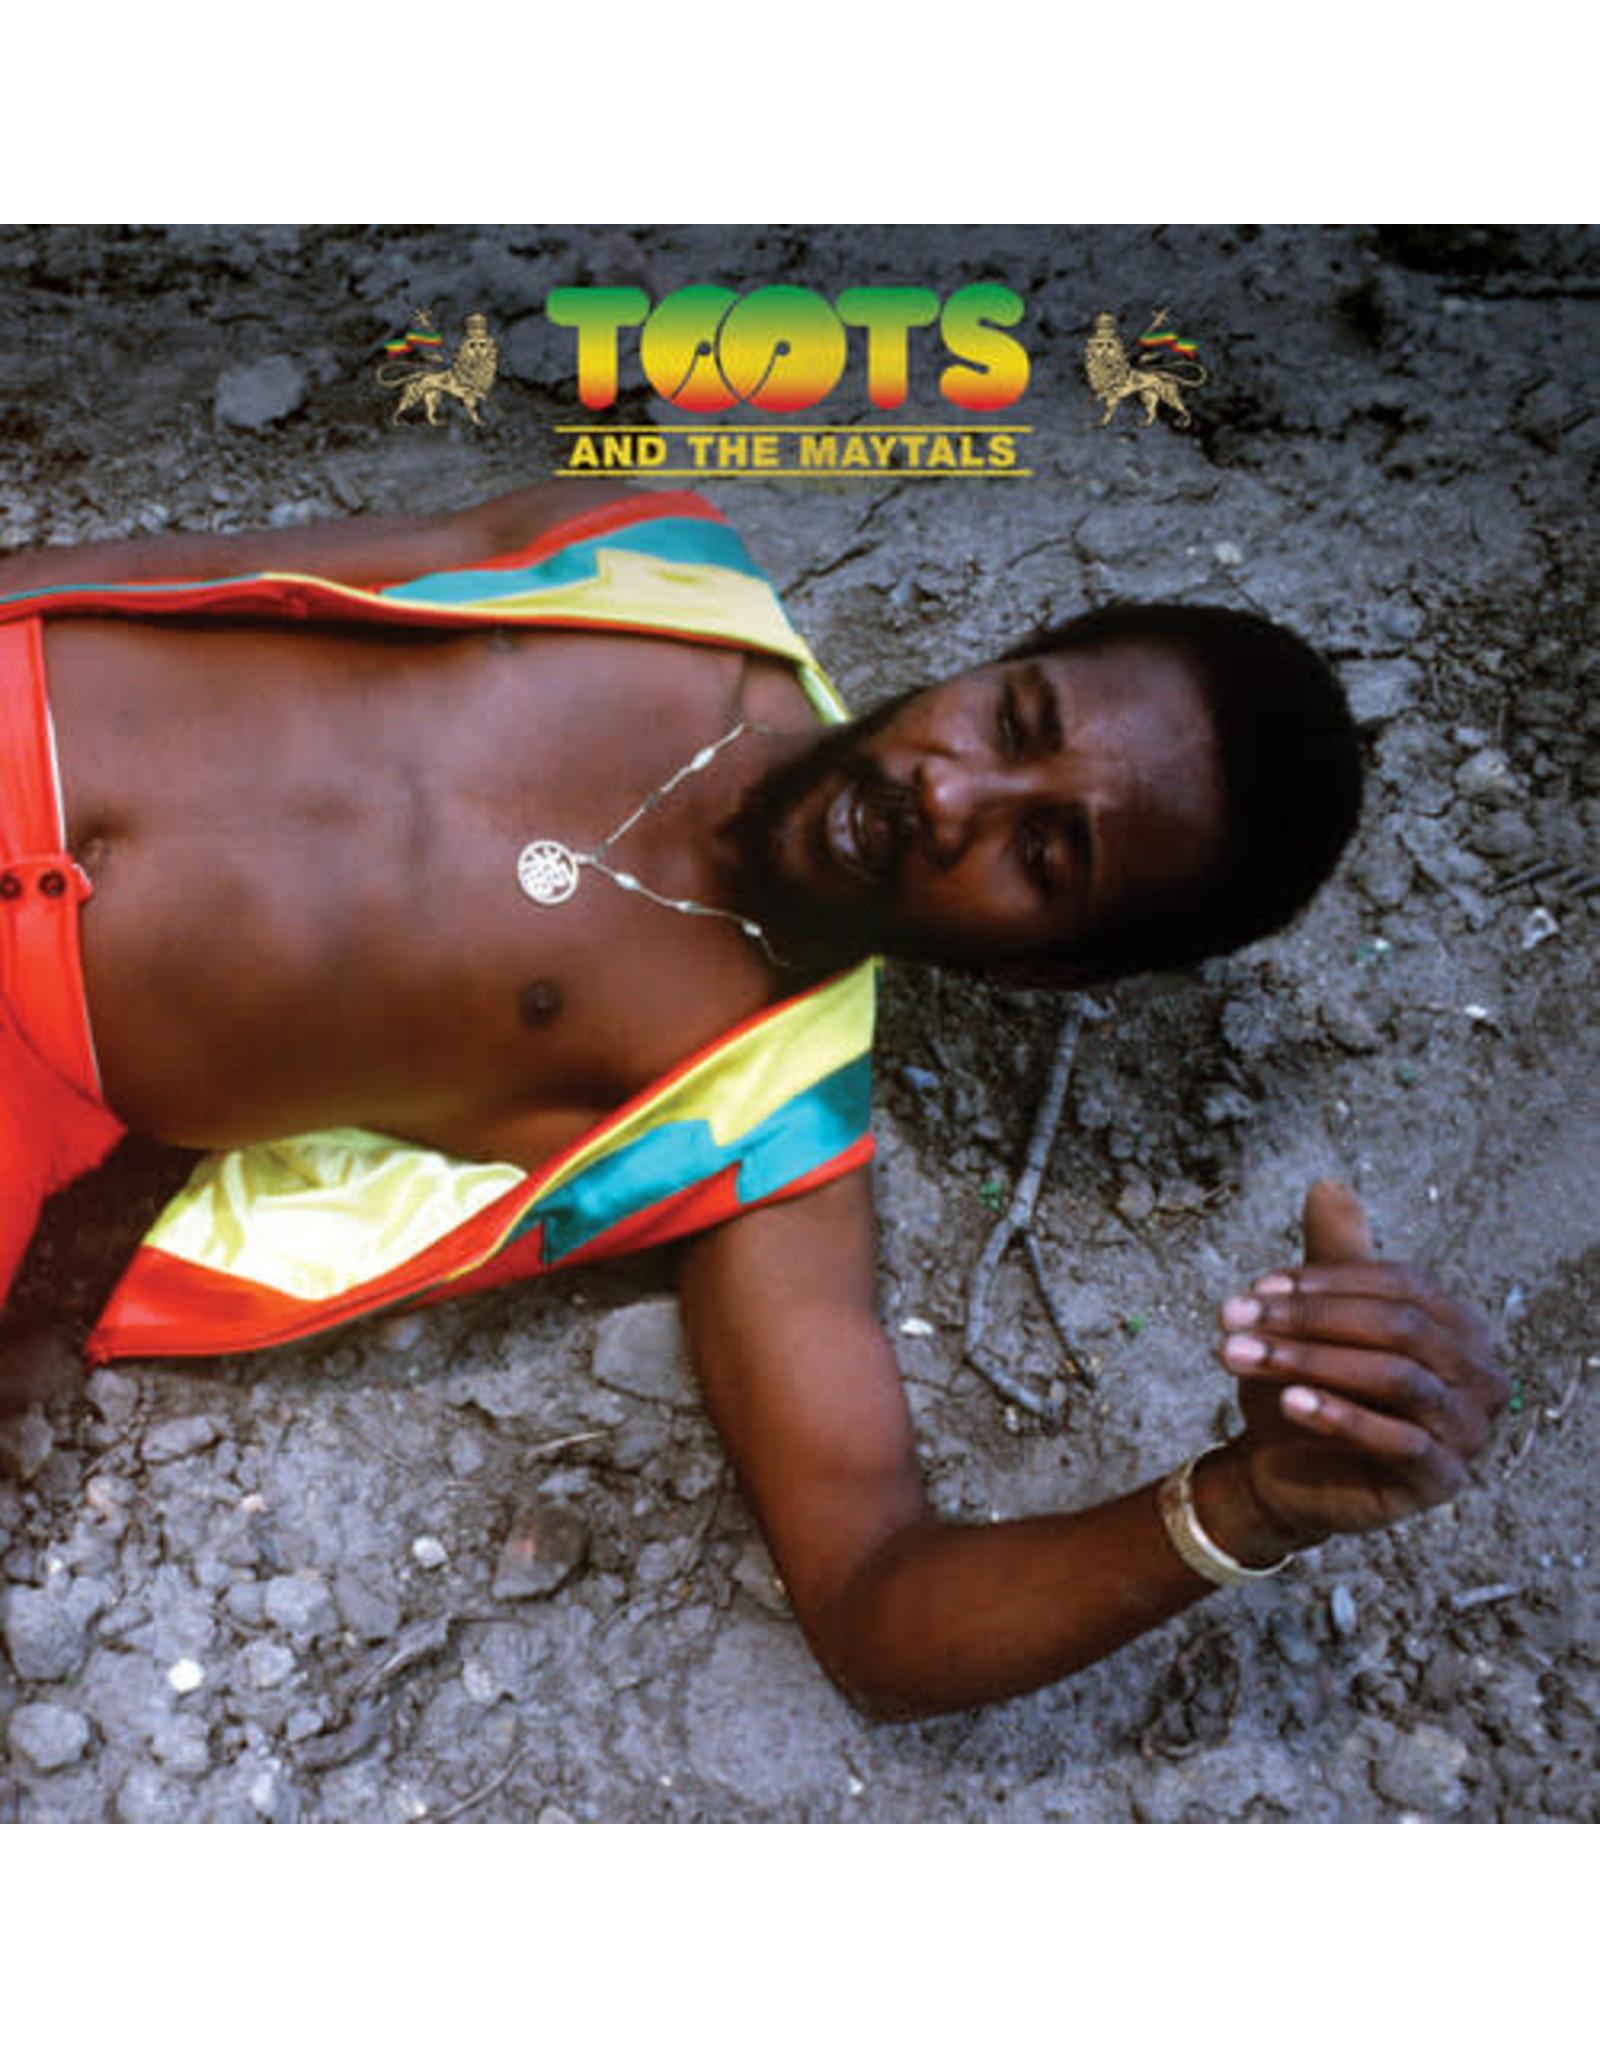 New Vinyl Toots & The Maytals - Pressure Drop: The Golden Tracks (Tri-Colored) LP